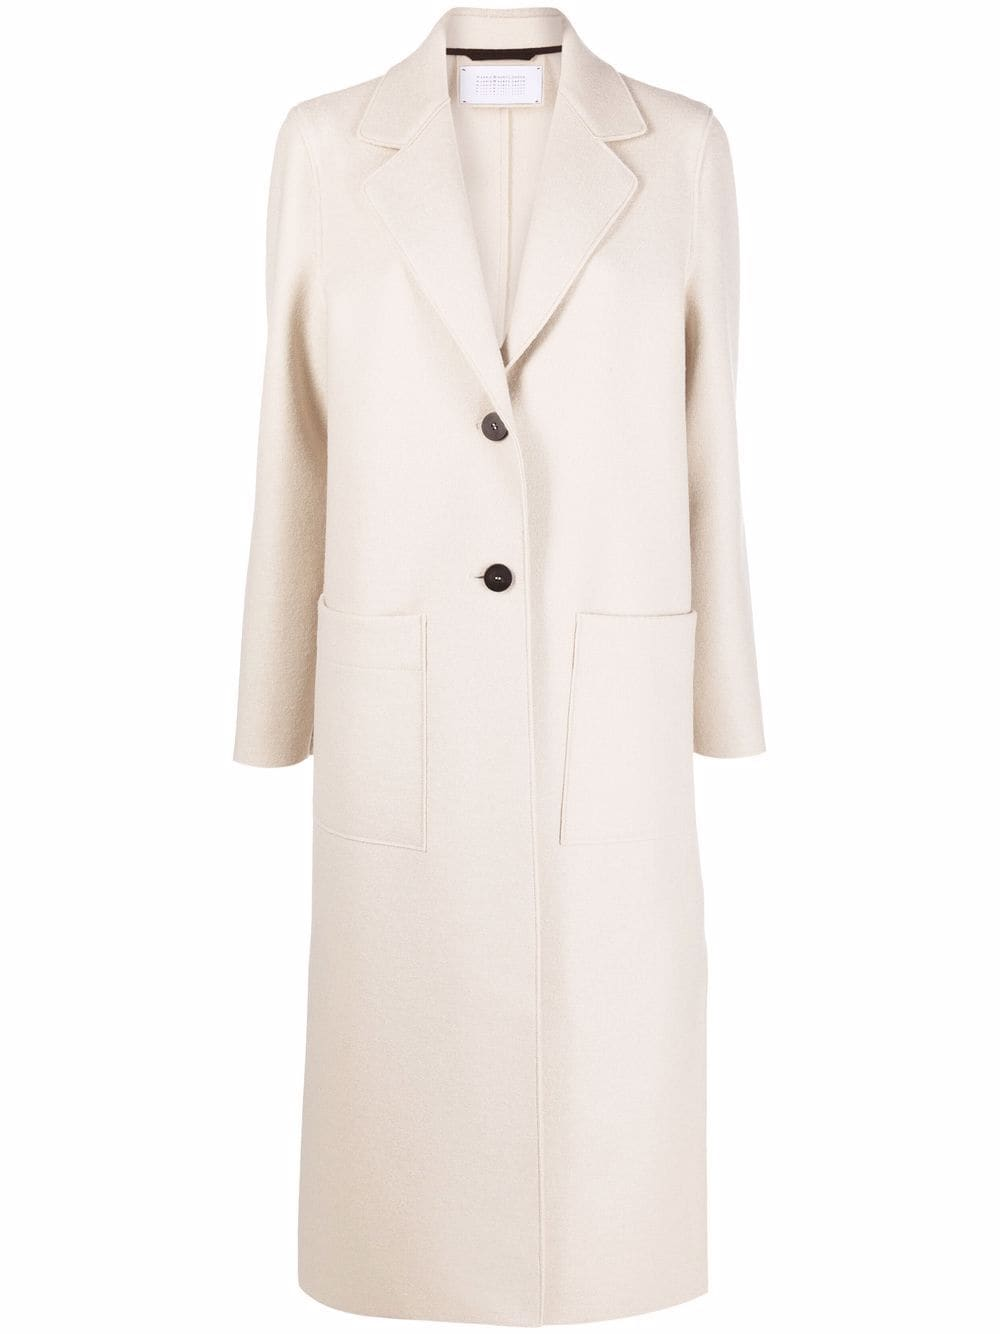 Picture of Harris Wharf London | Single-Breasted Virgin Wool-Felt Coat